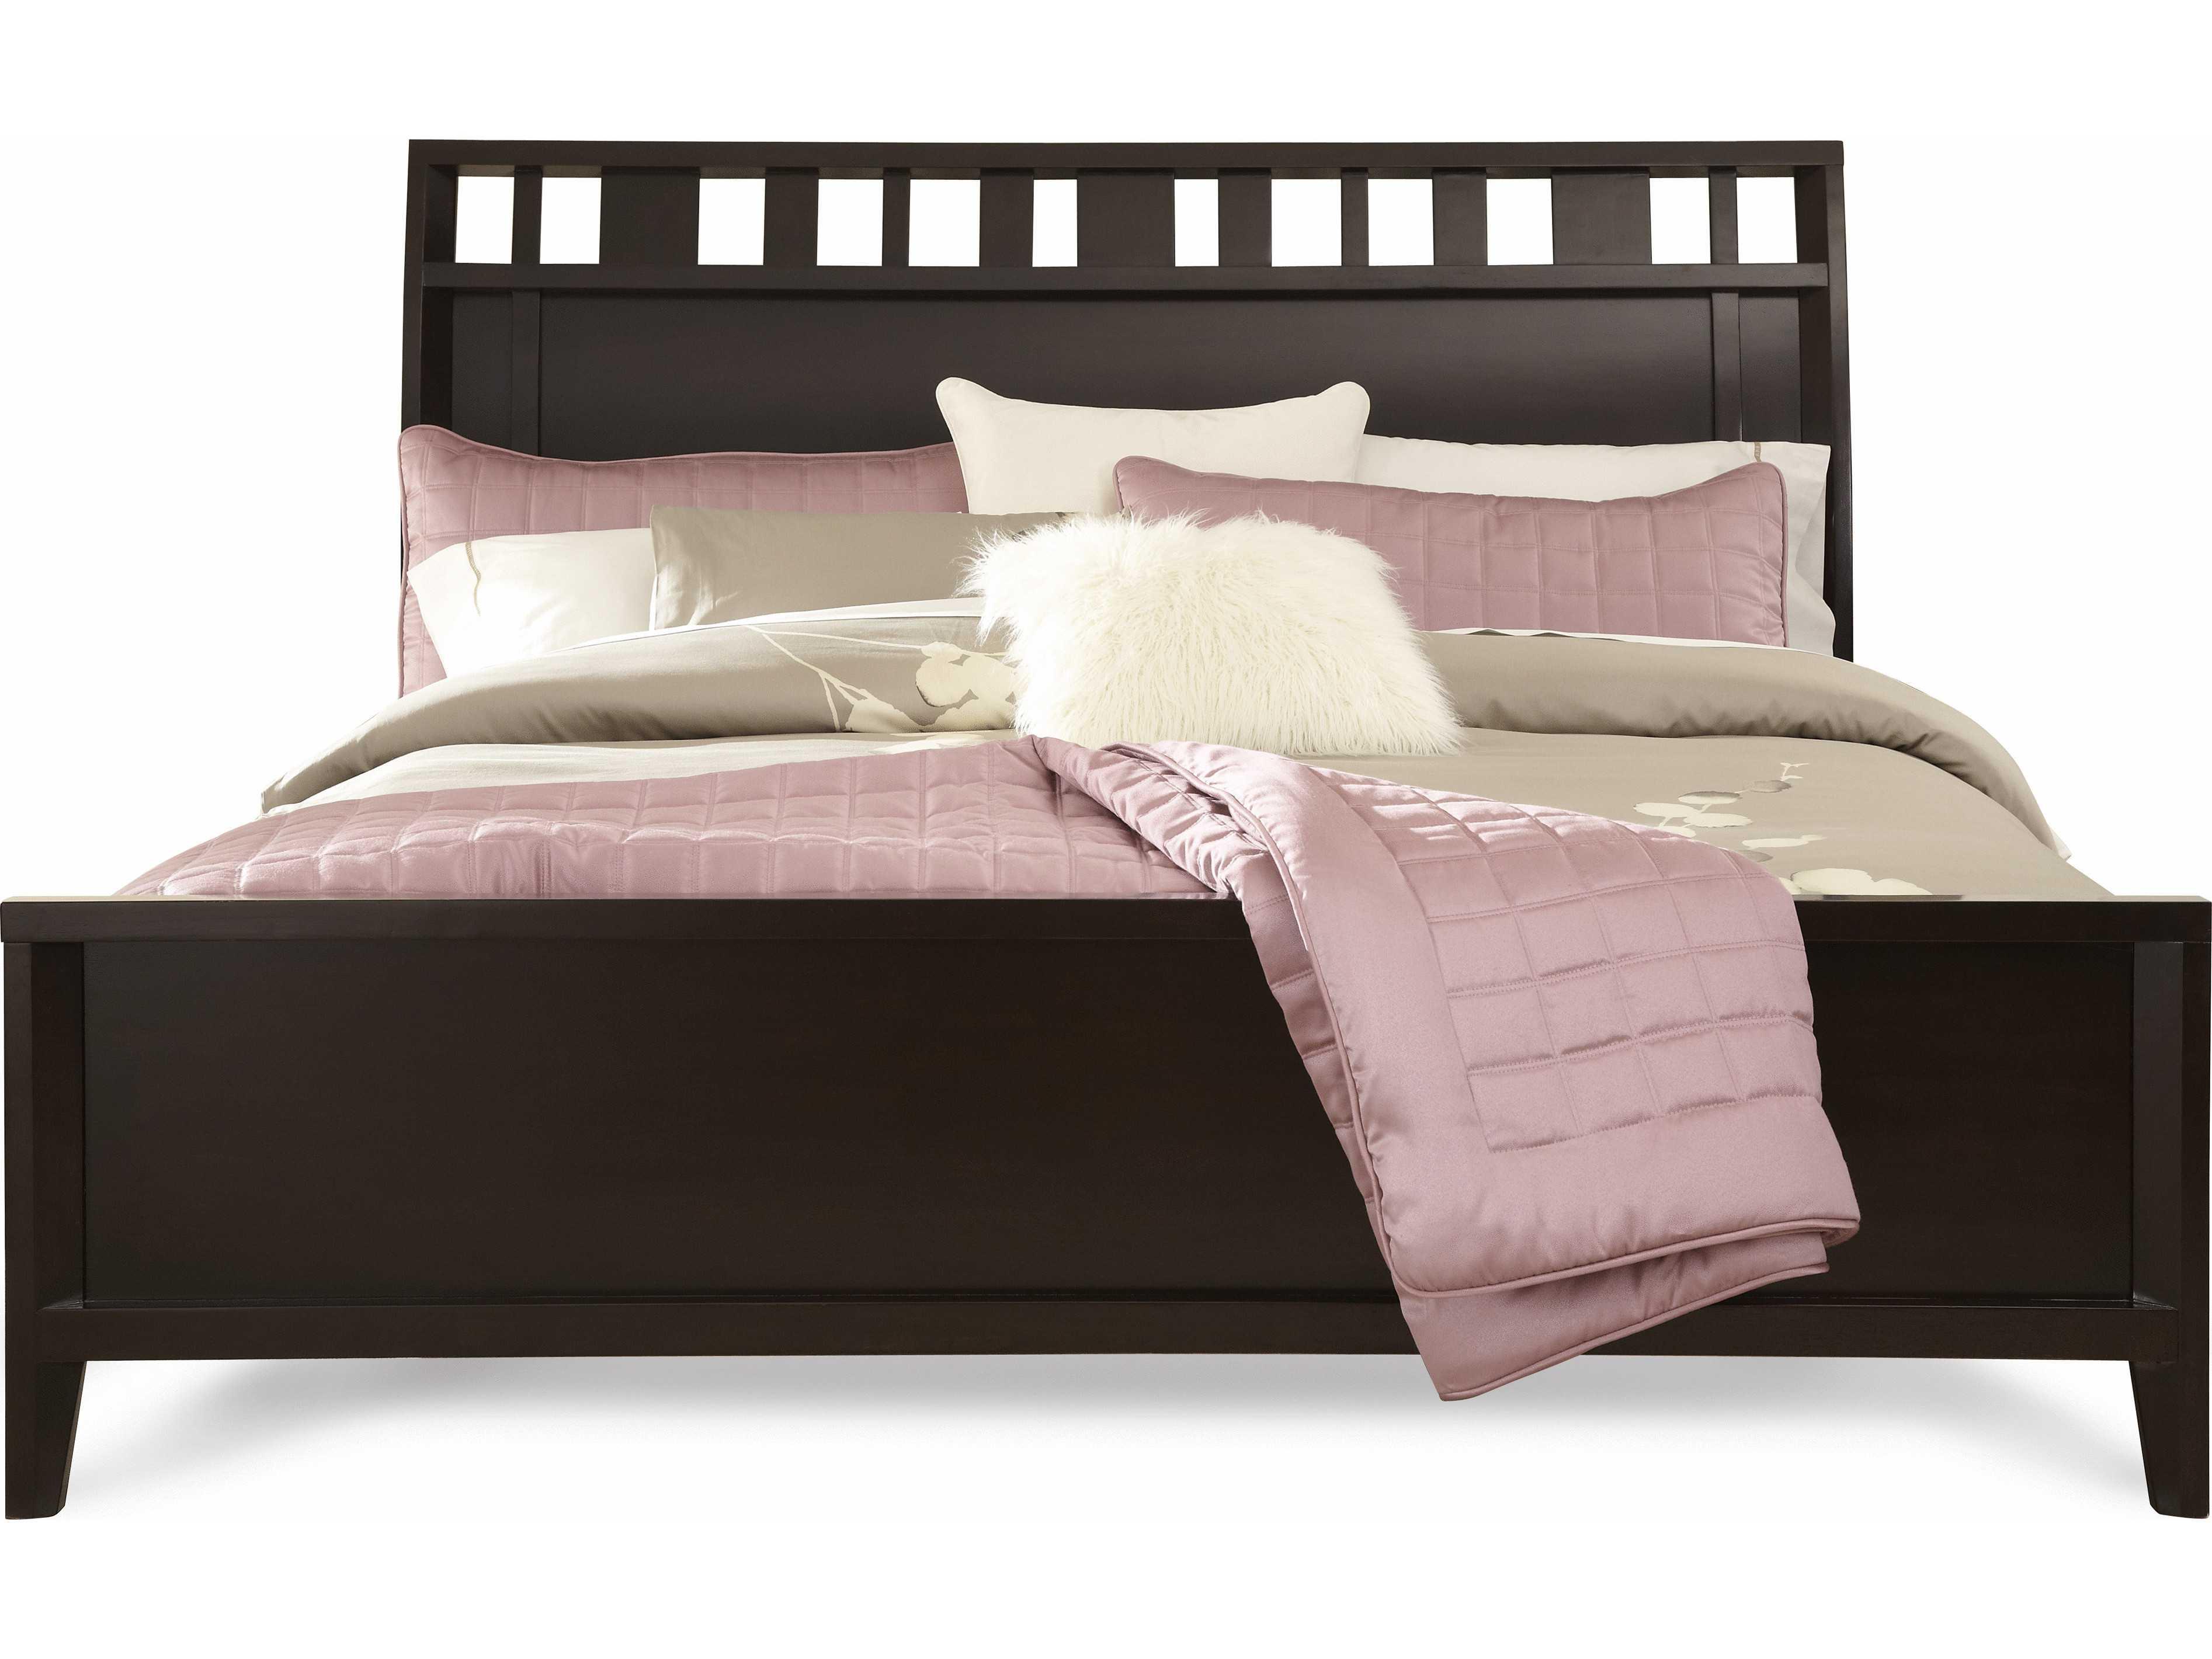 Casana Beckett Dark Birch Sleigh Queen Bed CX355920KQ